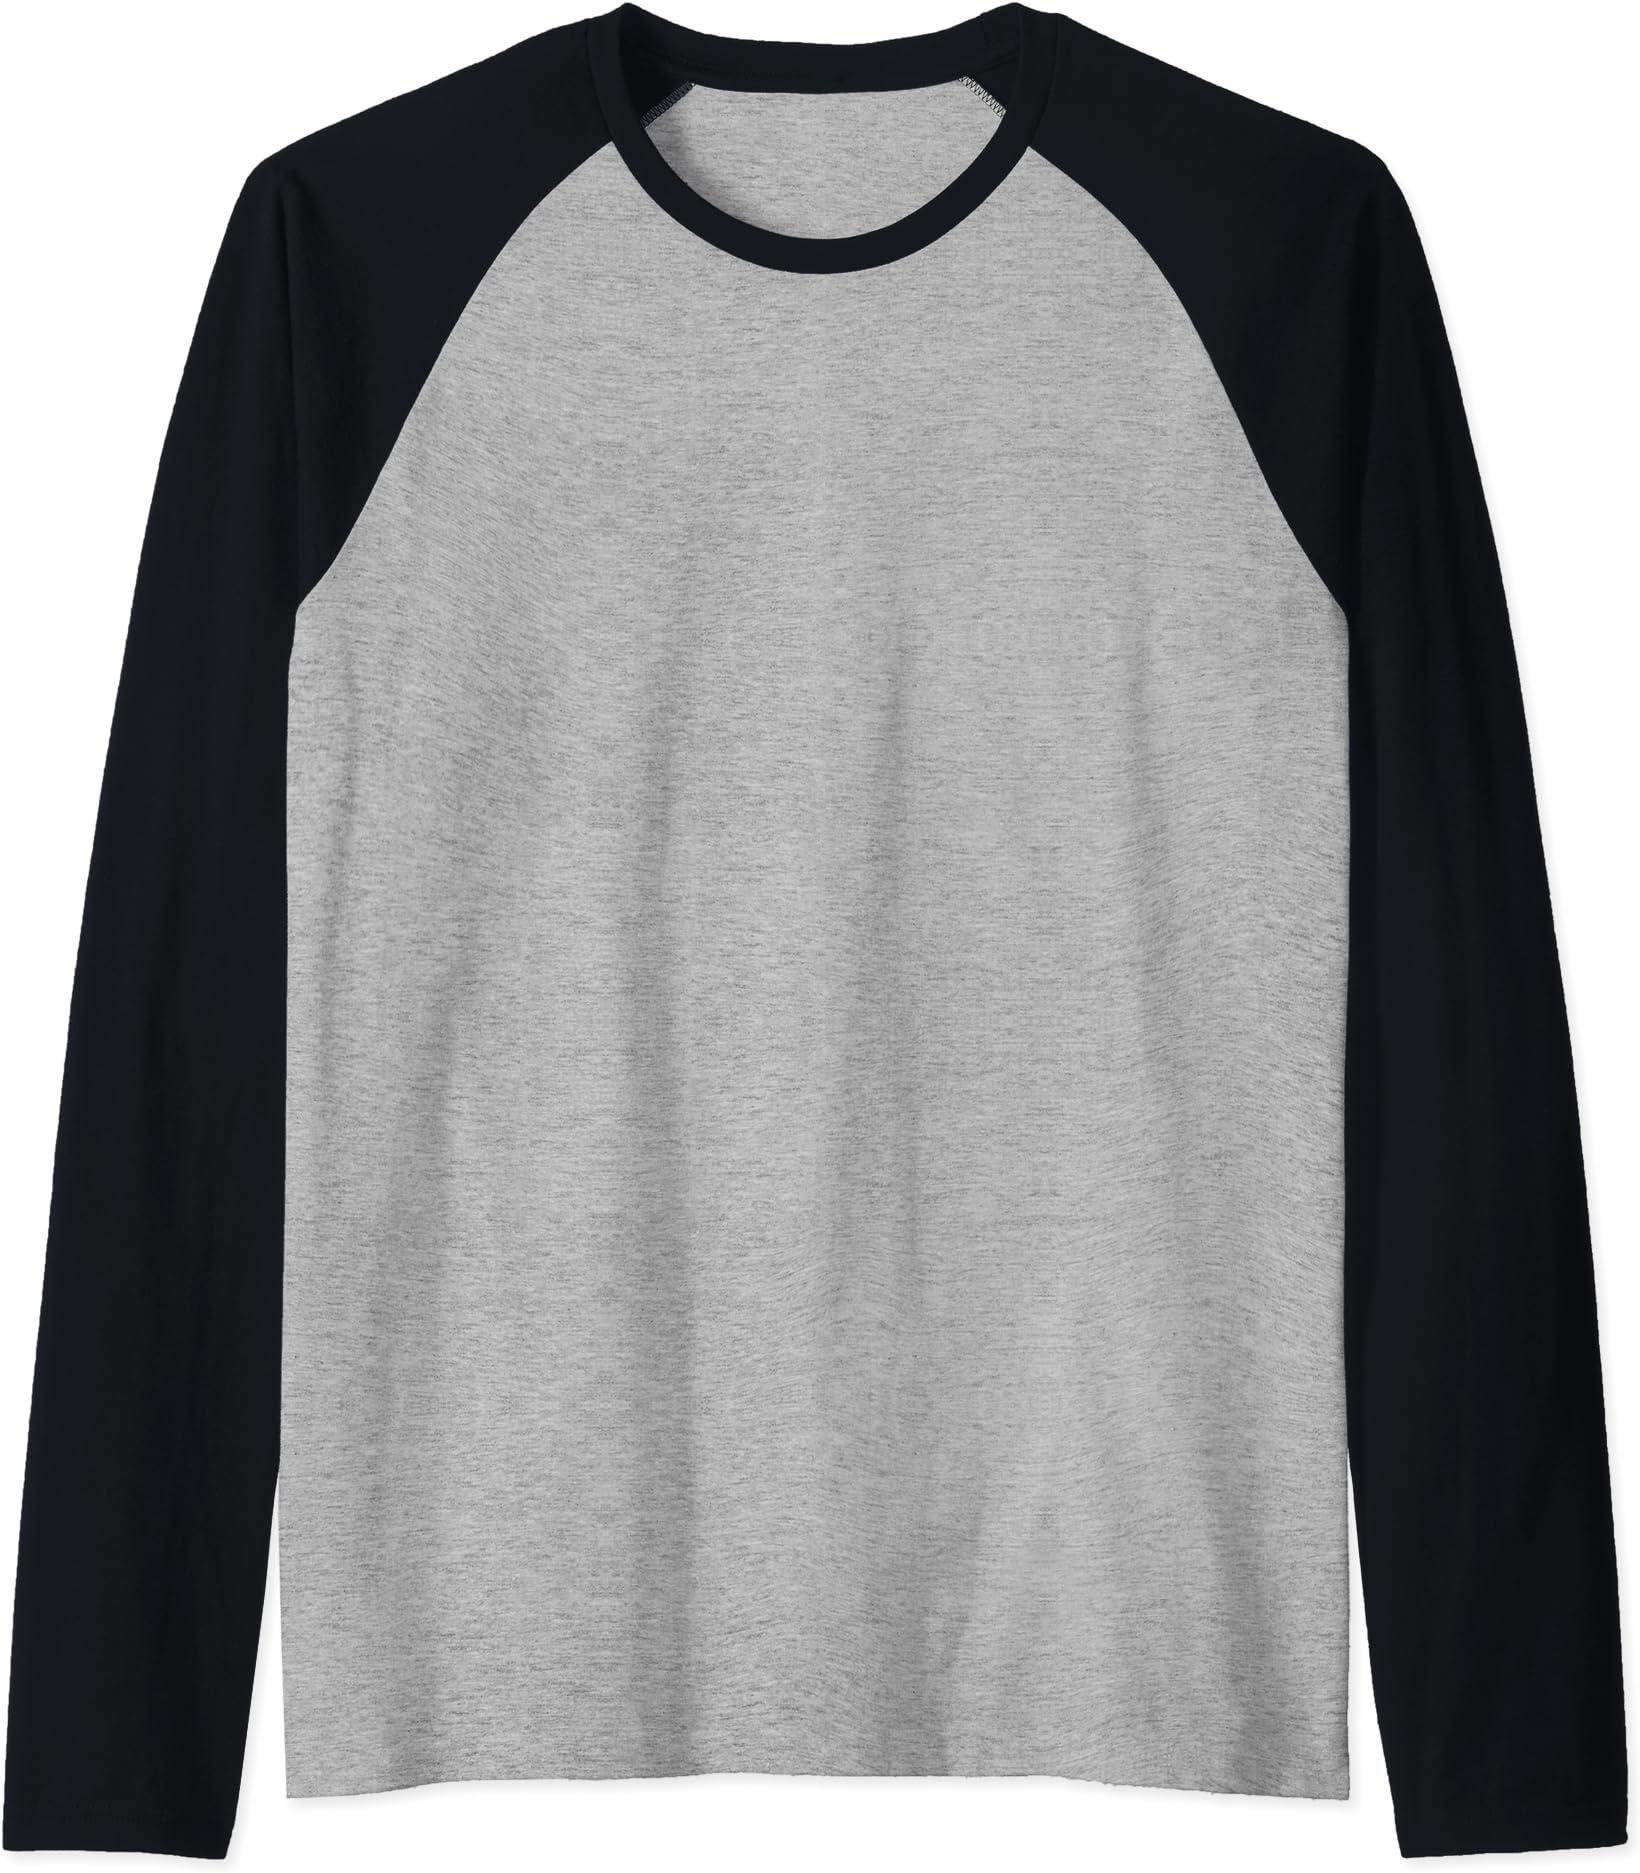 Clearance Sale Batman Shirt Batman v Superman T-Shirt Dawn of Justice Tees M-XL